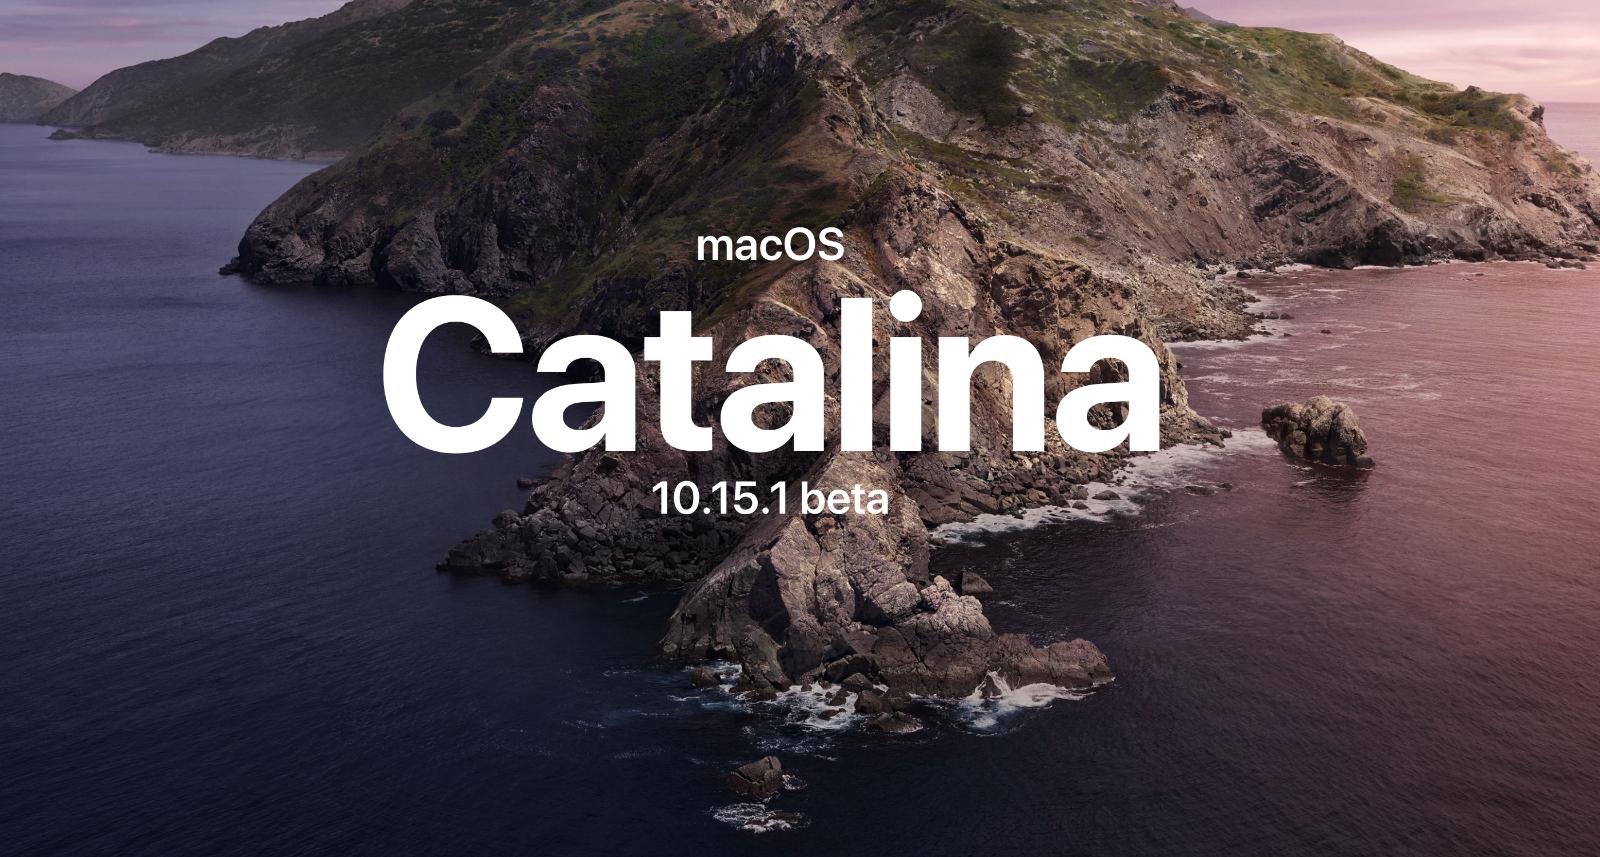 macOS Catalina 10.15.1 beta